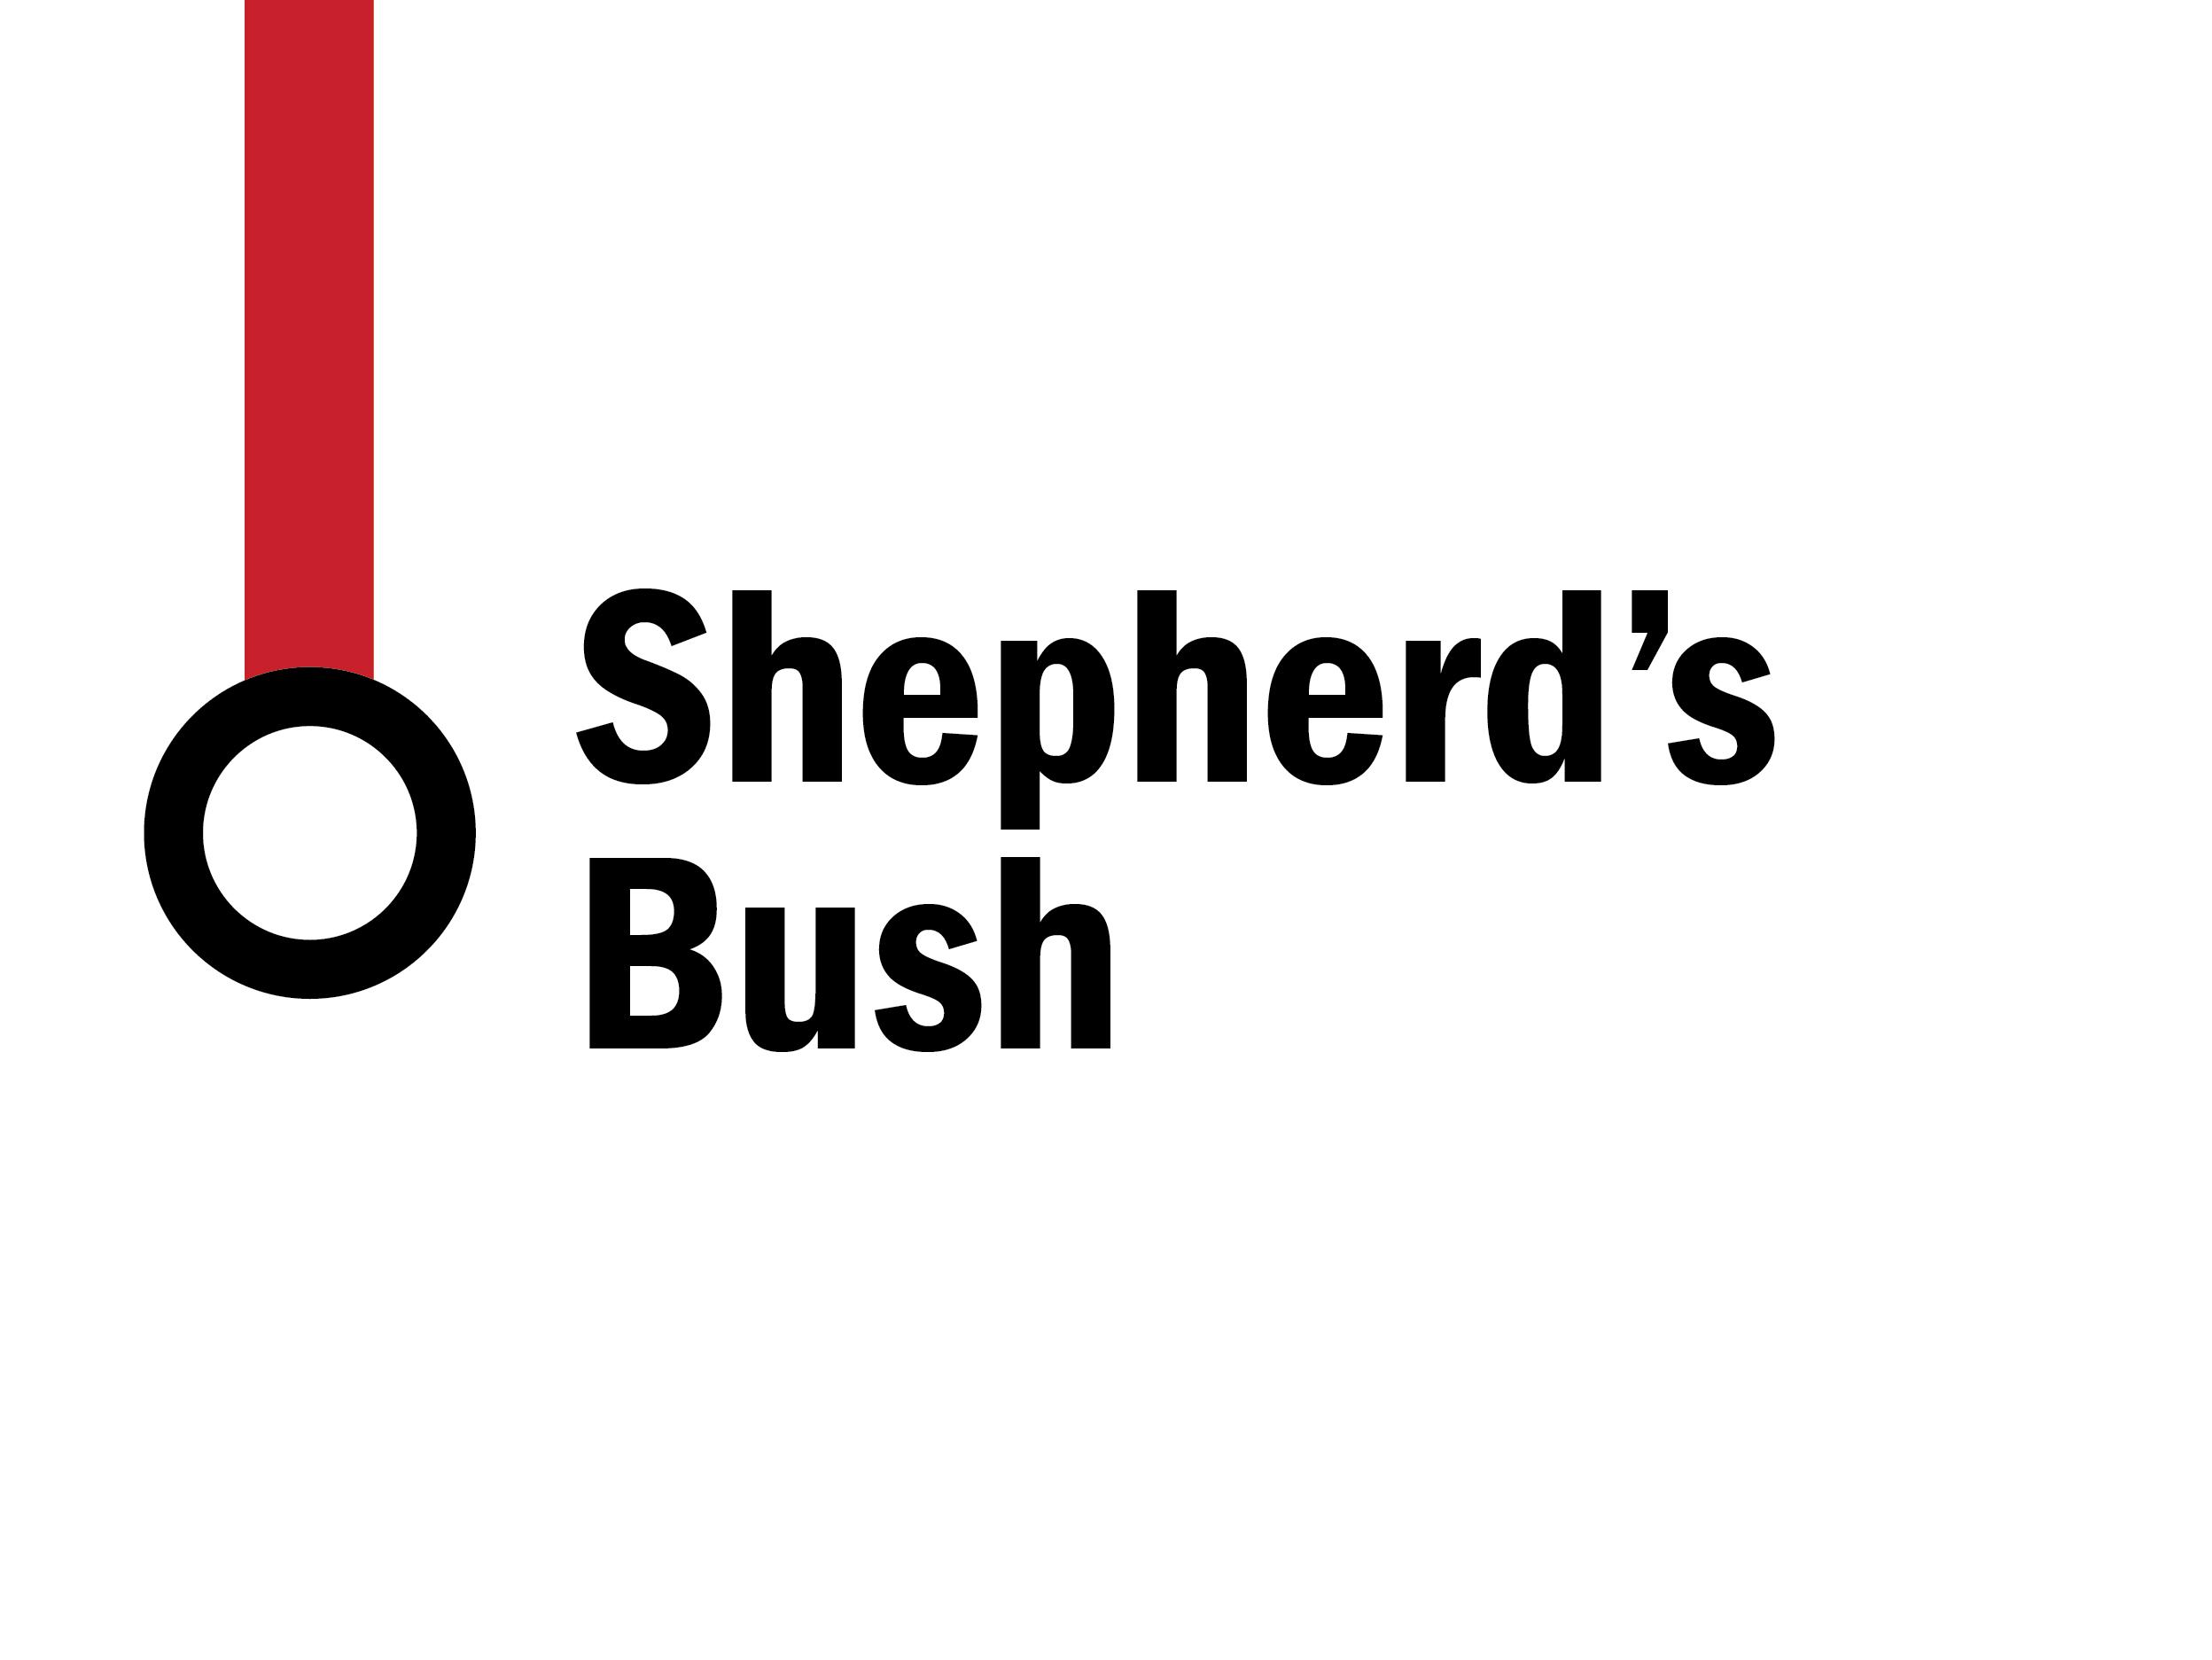 Night tube: Shepherd's Bush